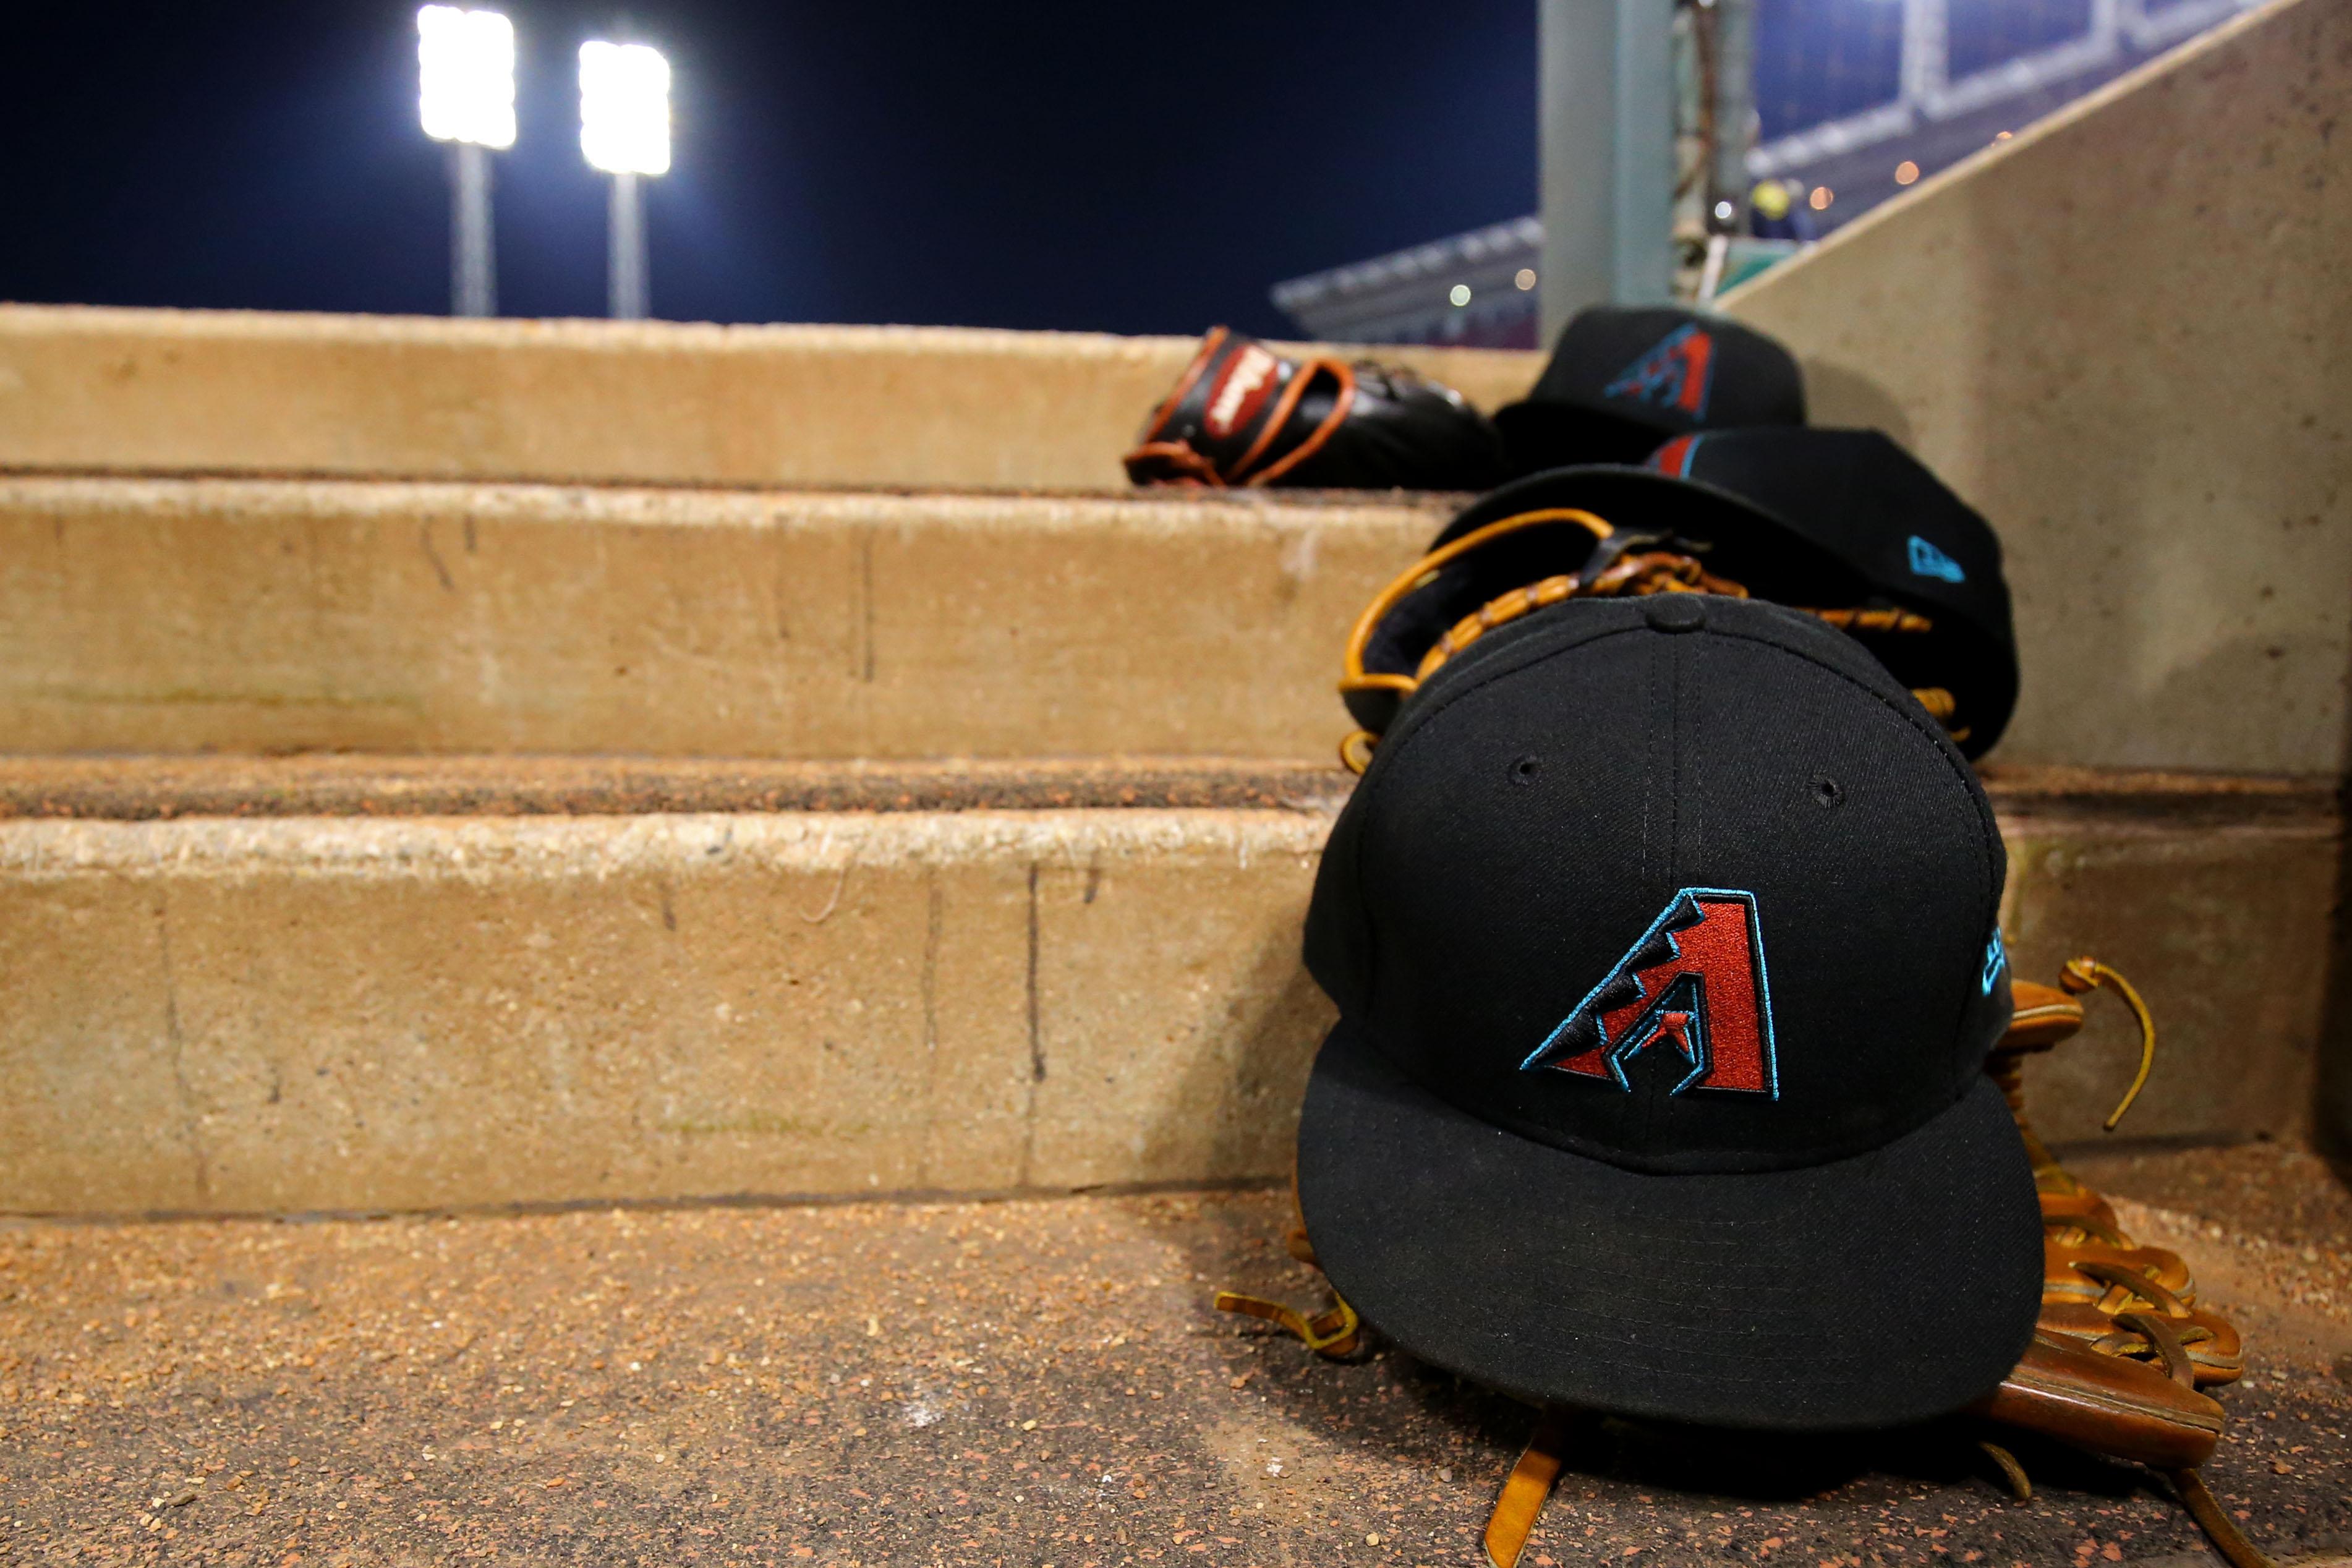 MLB: Arizona Diamondbacks at Cincinnati Reds